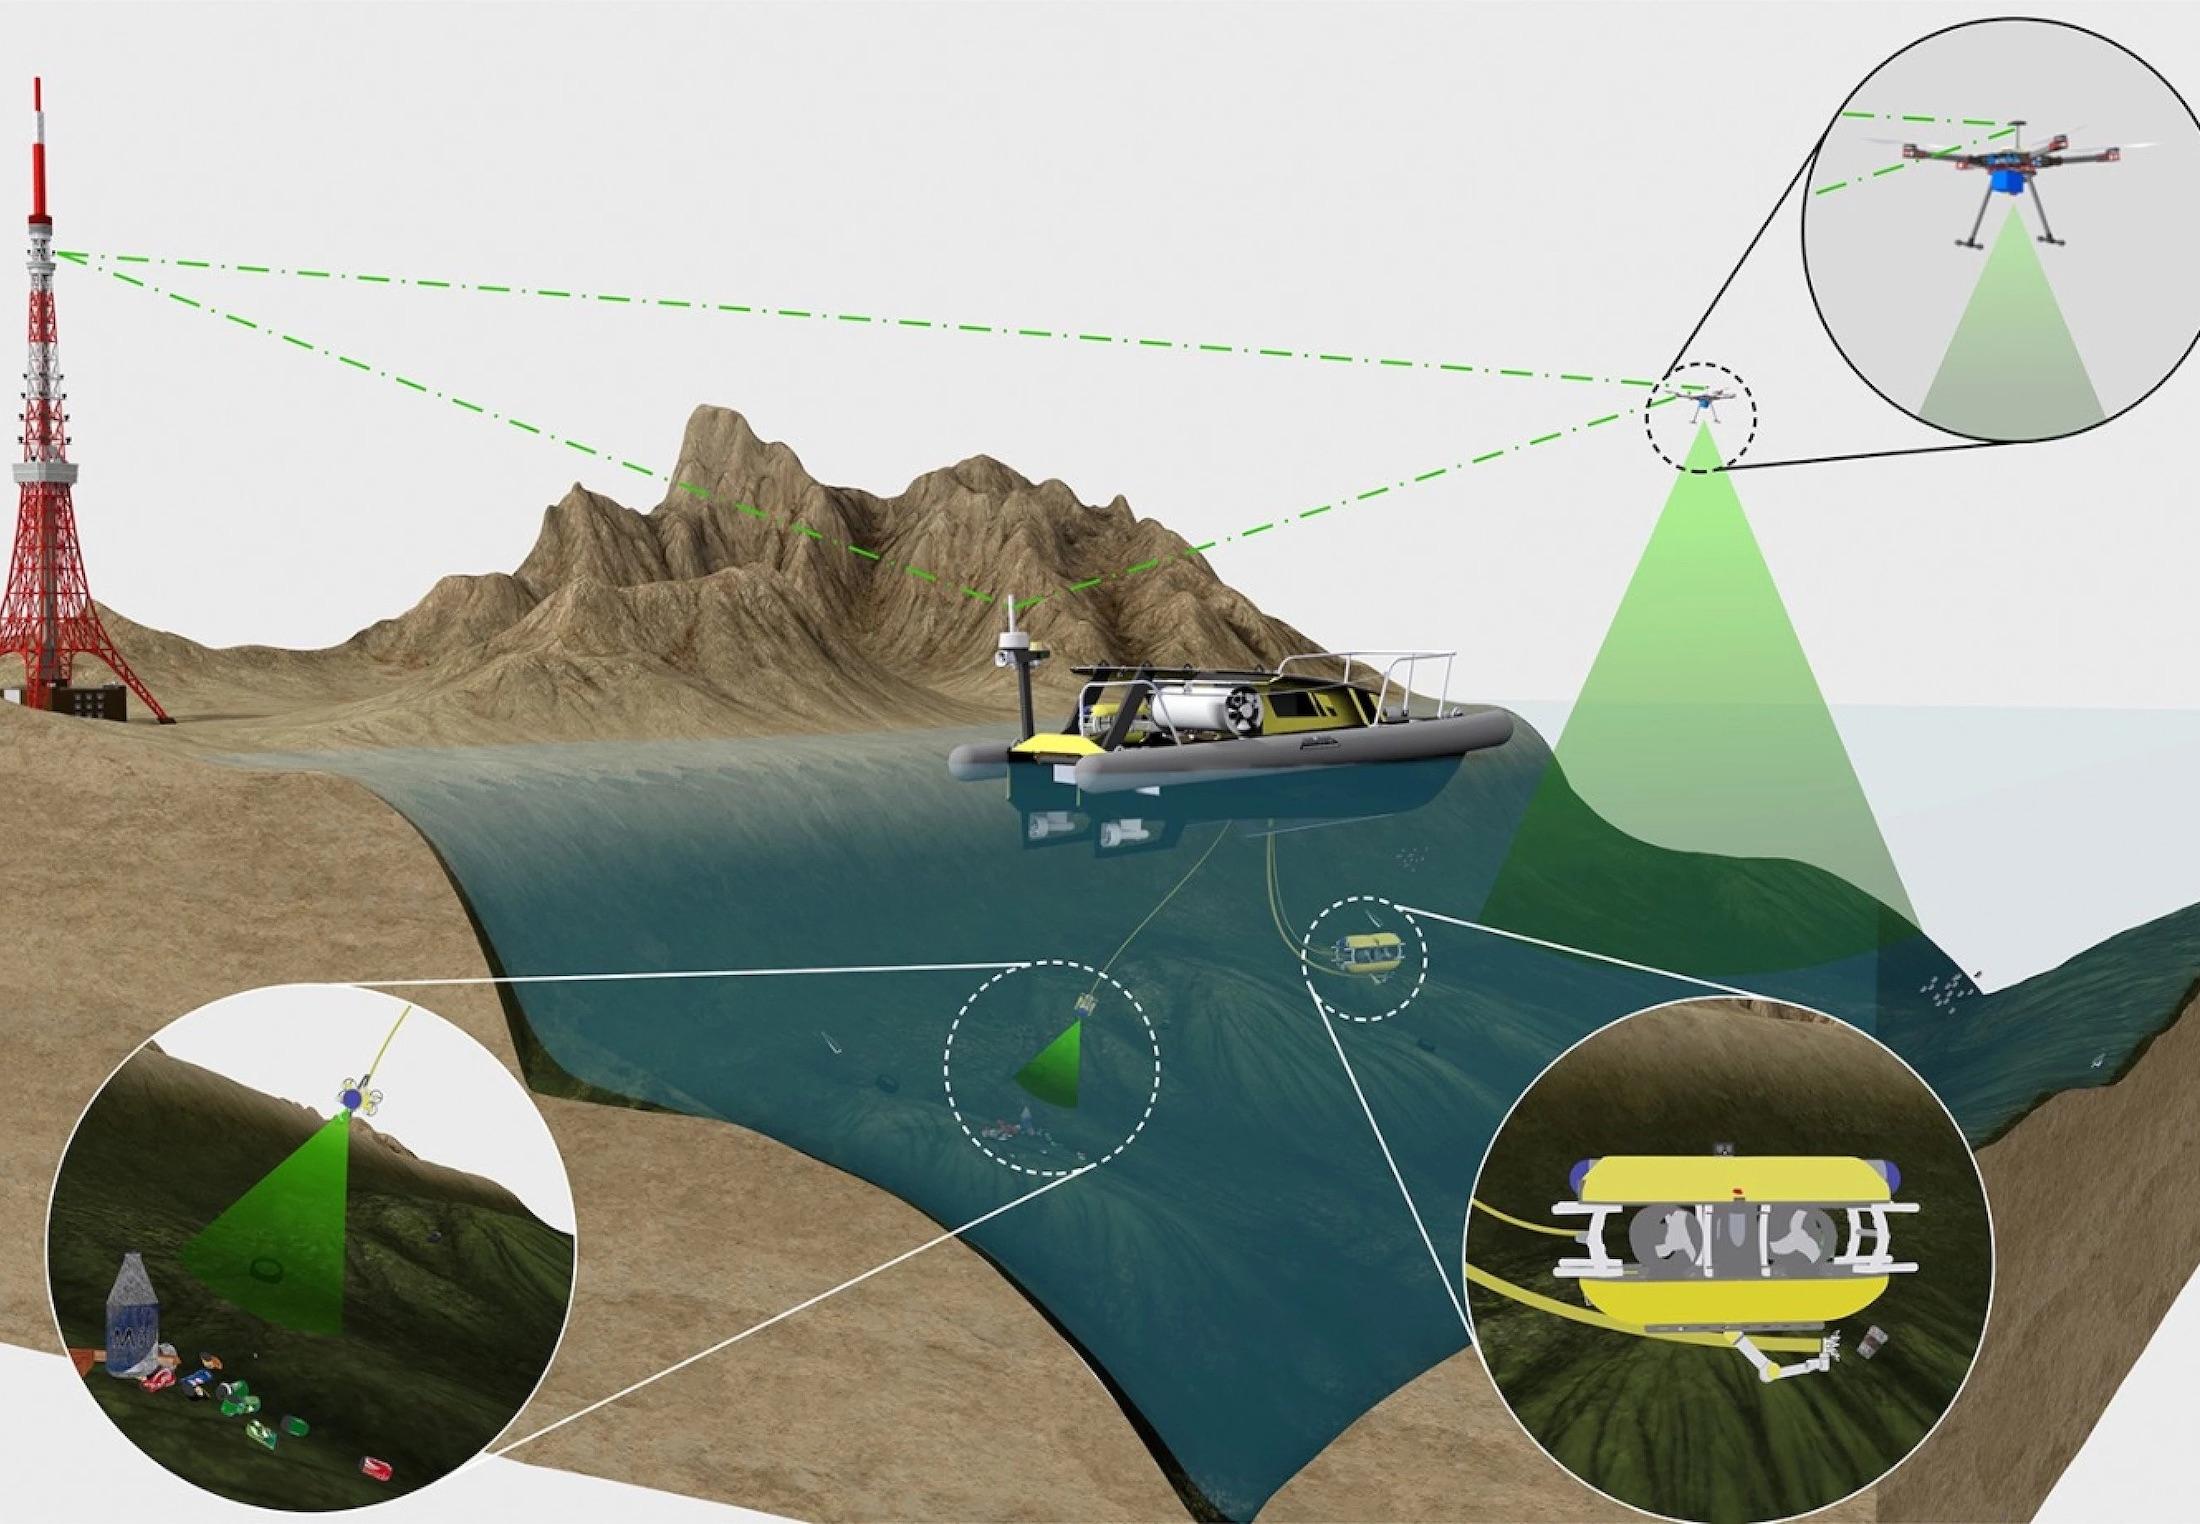 Intelligente droner støvsuger havet for plast | illvit.no